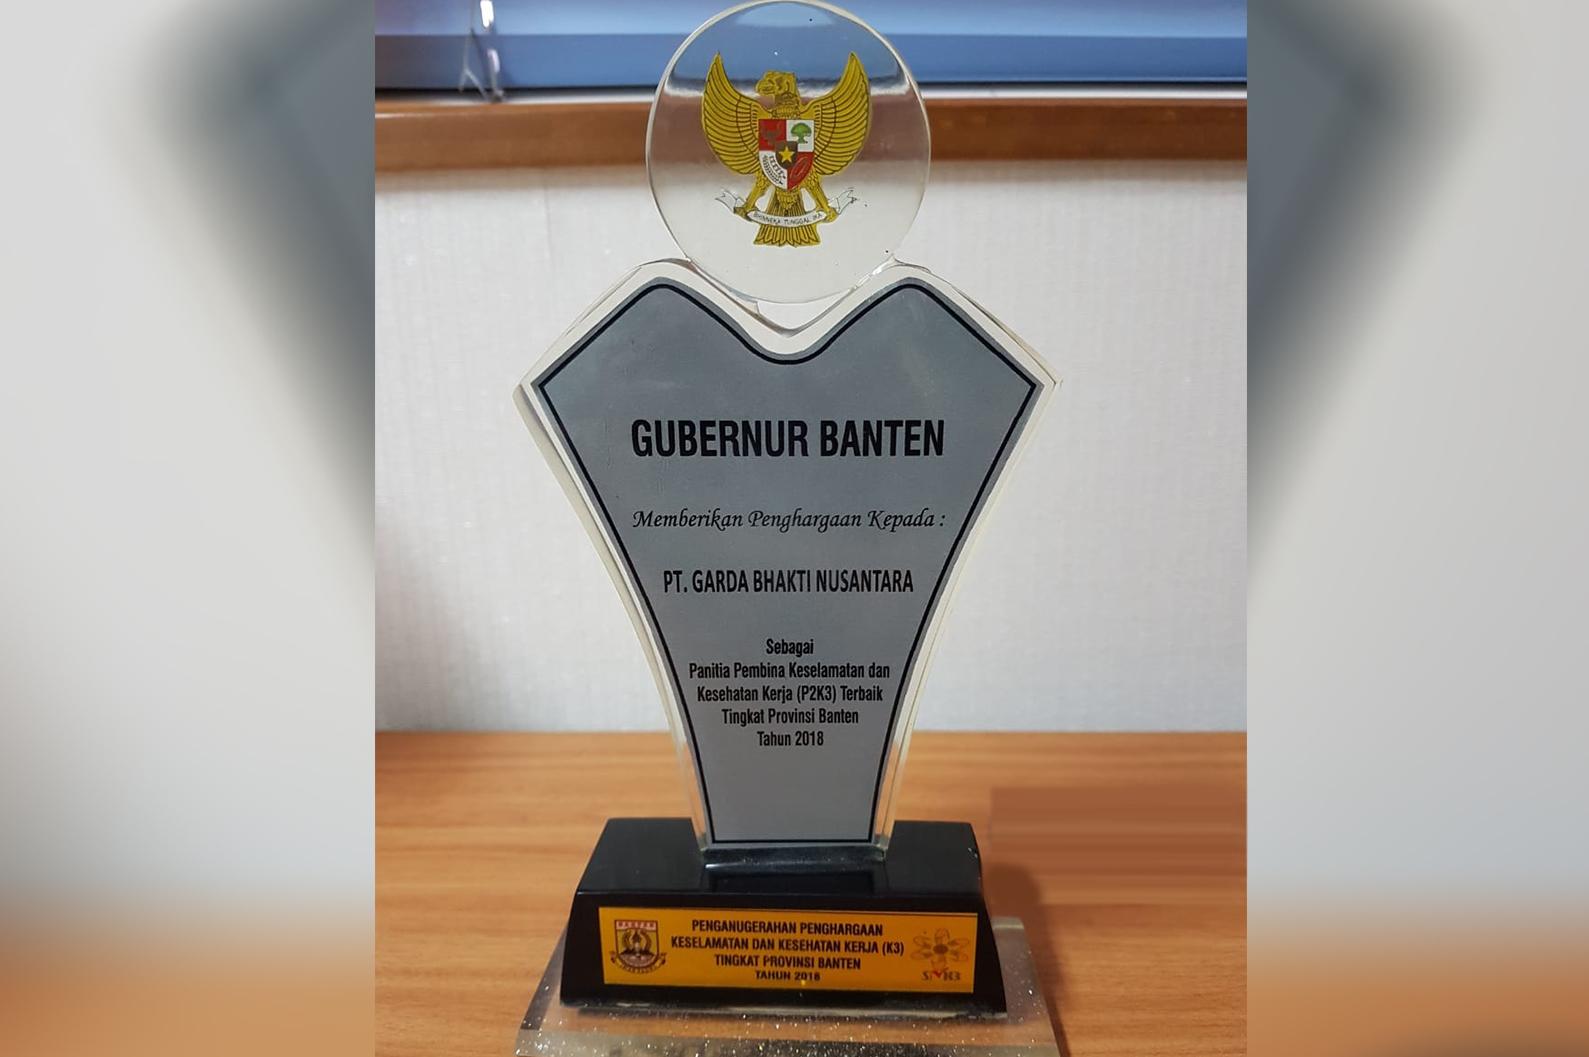 Penghargaan Gubernur Banten untuk GBN